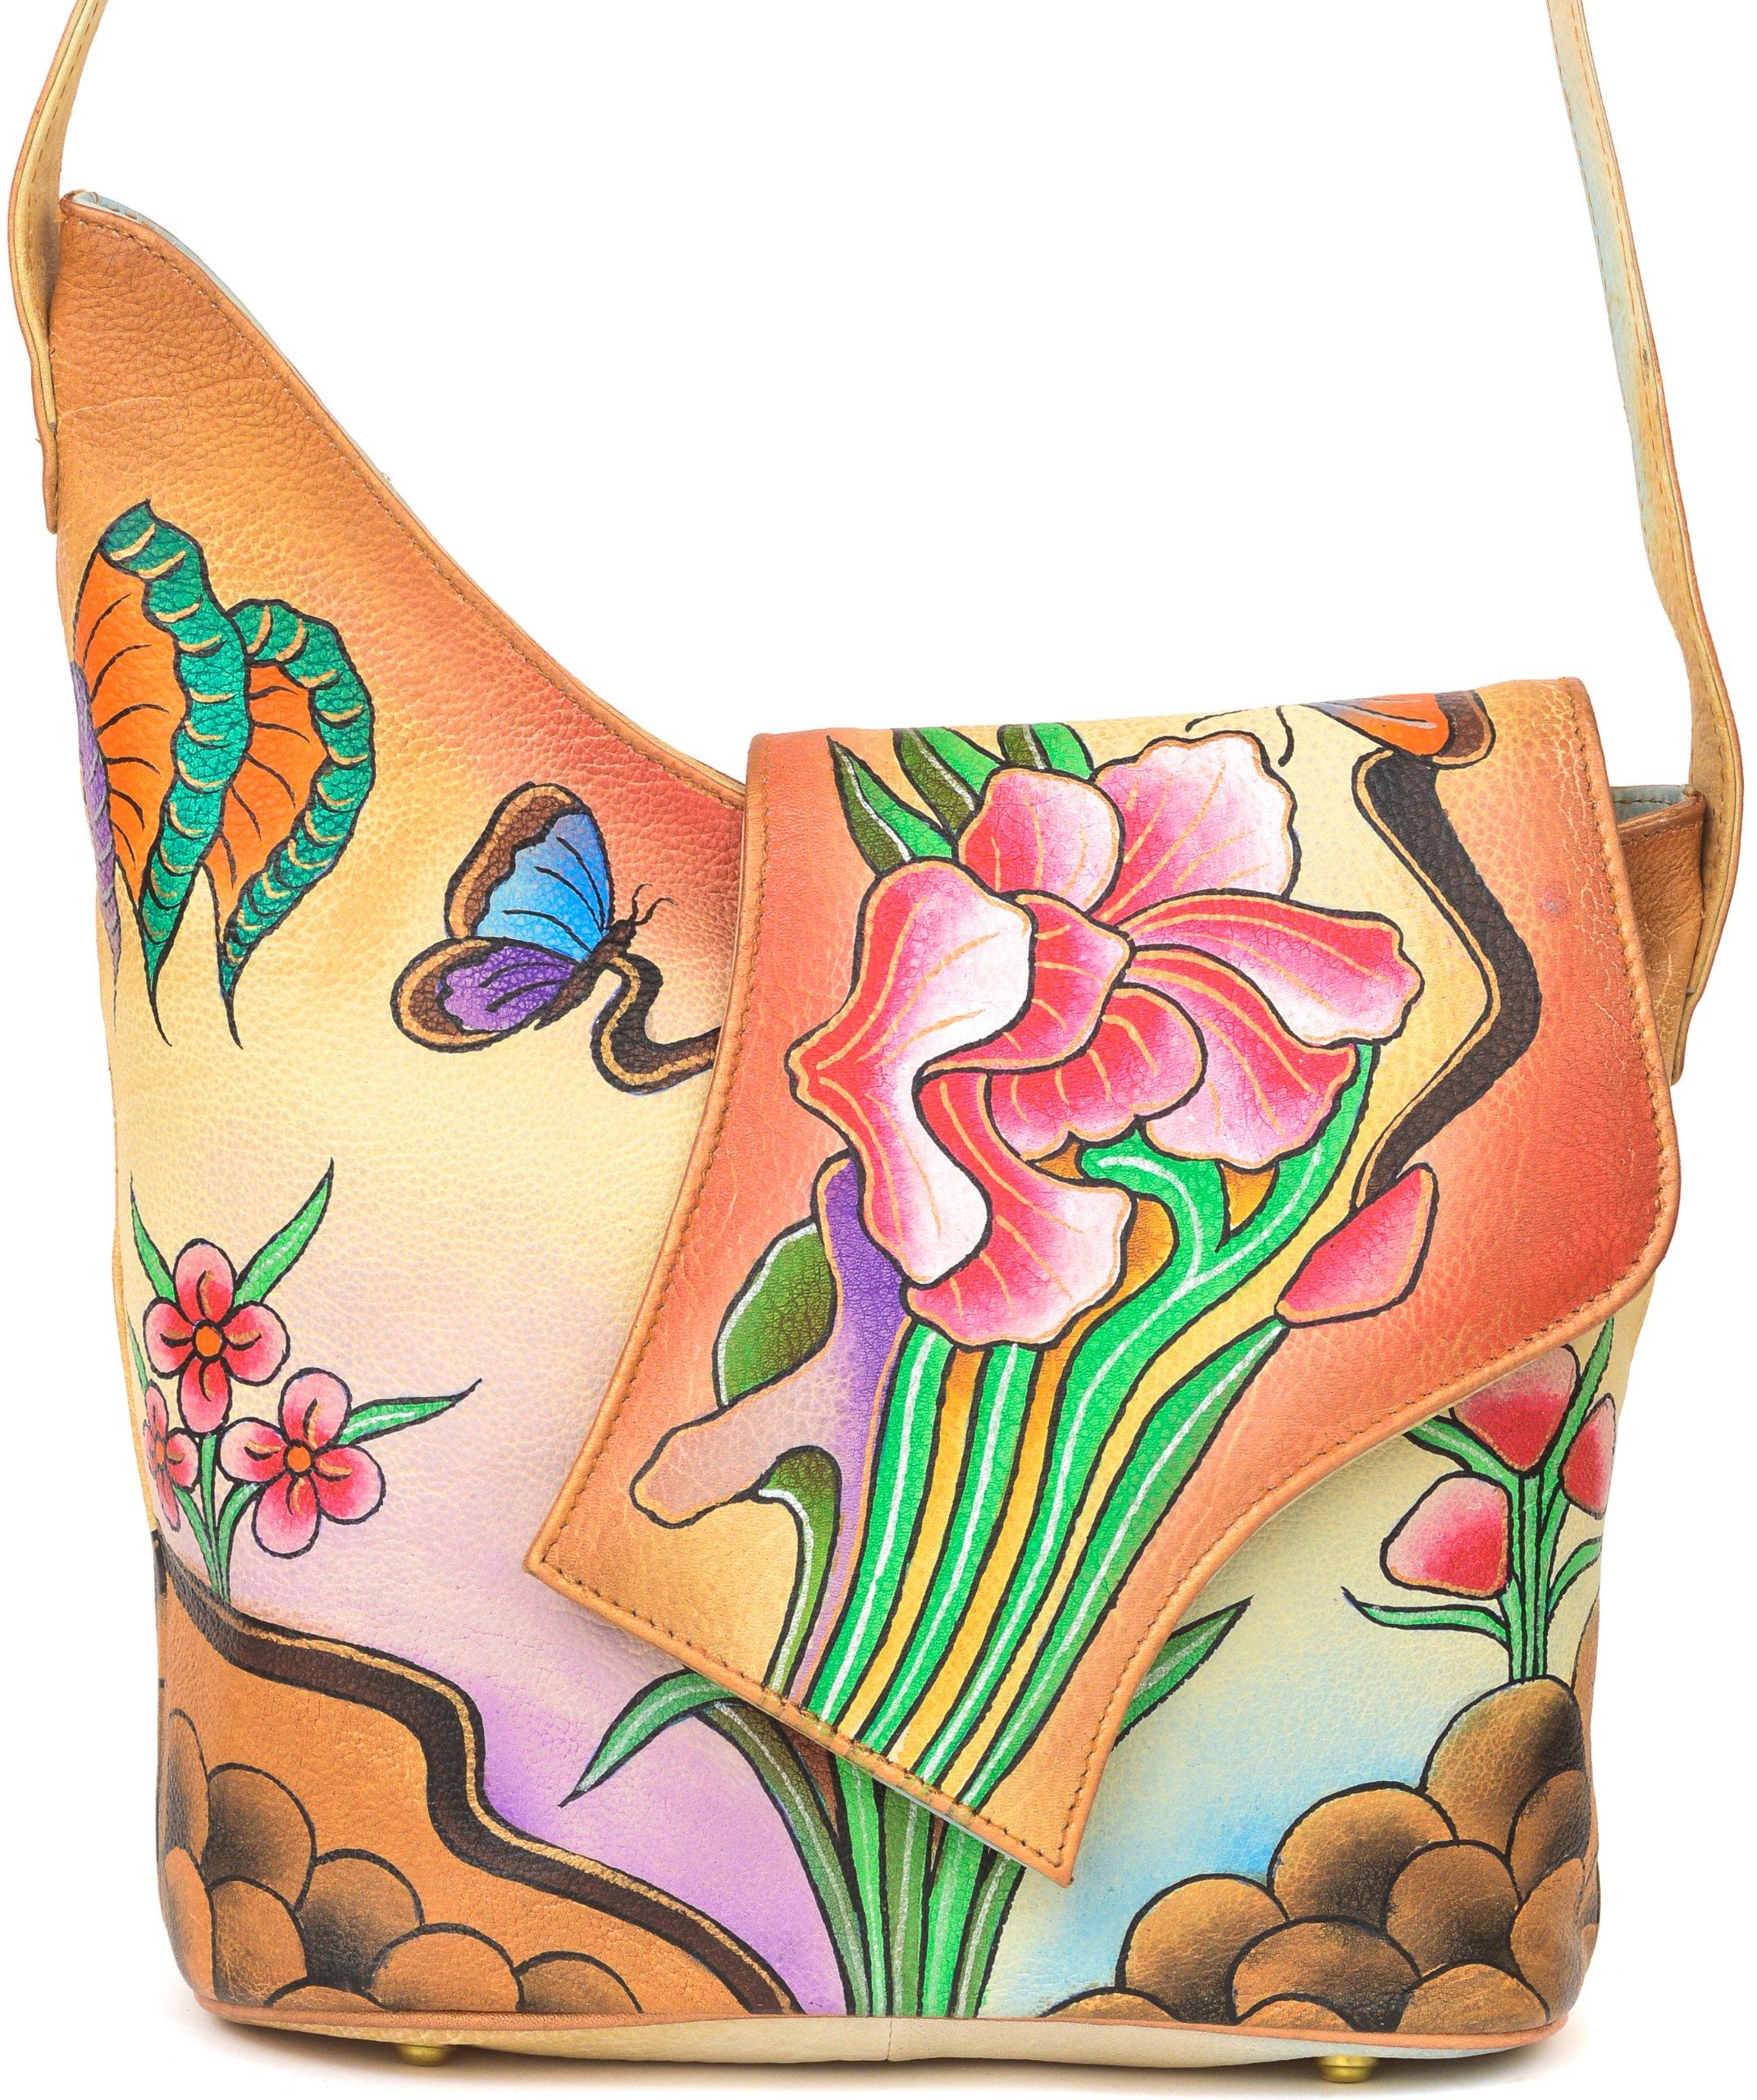 ZIMBELMANN SARAH Genuine Nappa Leather Hand-painted Cross Body Flap Shoulder Bag